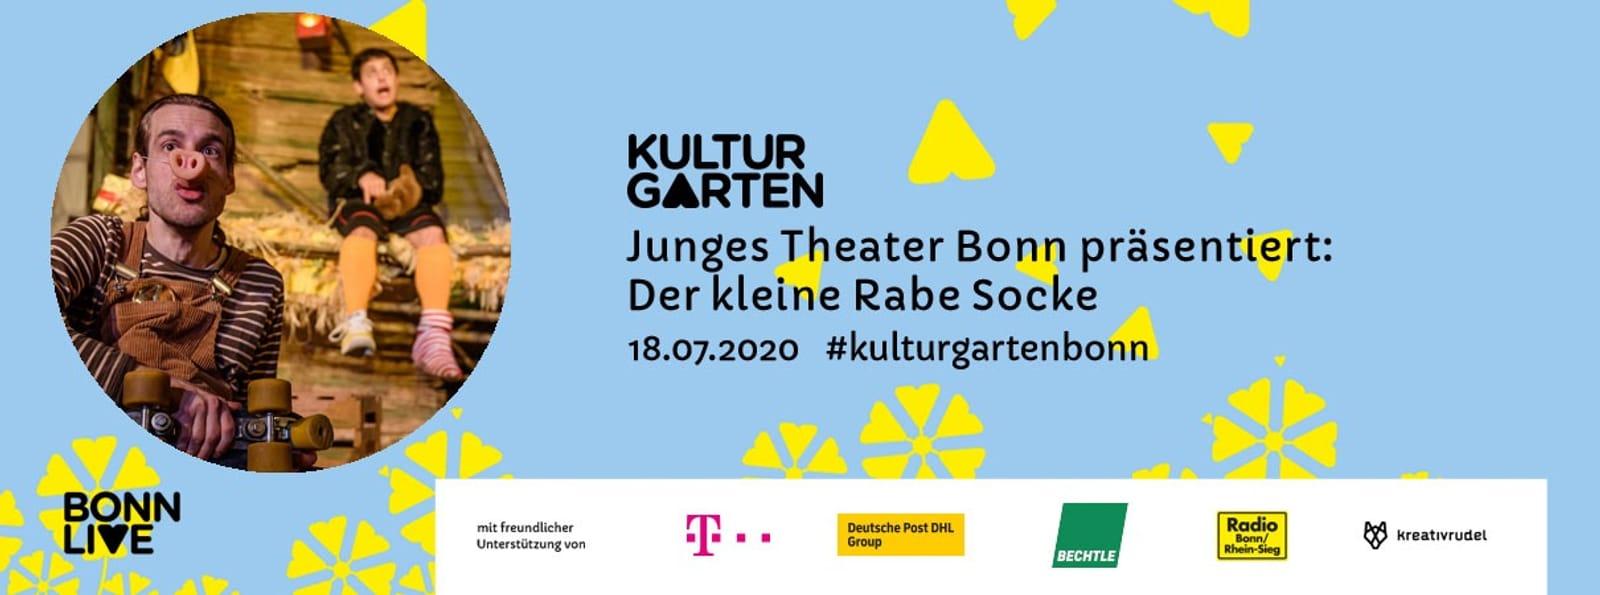 JTB: Der kleine Rabe Socke | BonnLive Kulturgarten